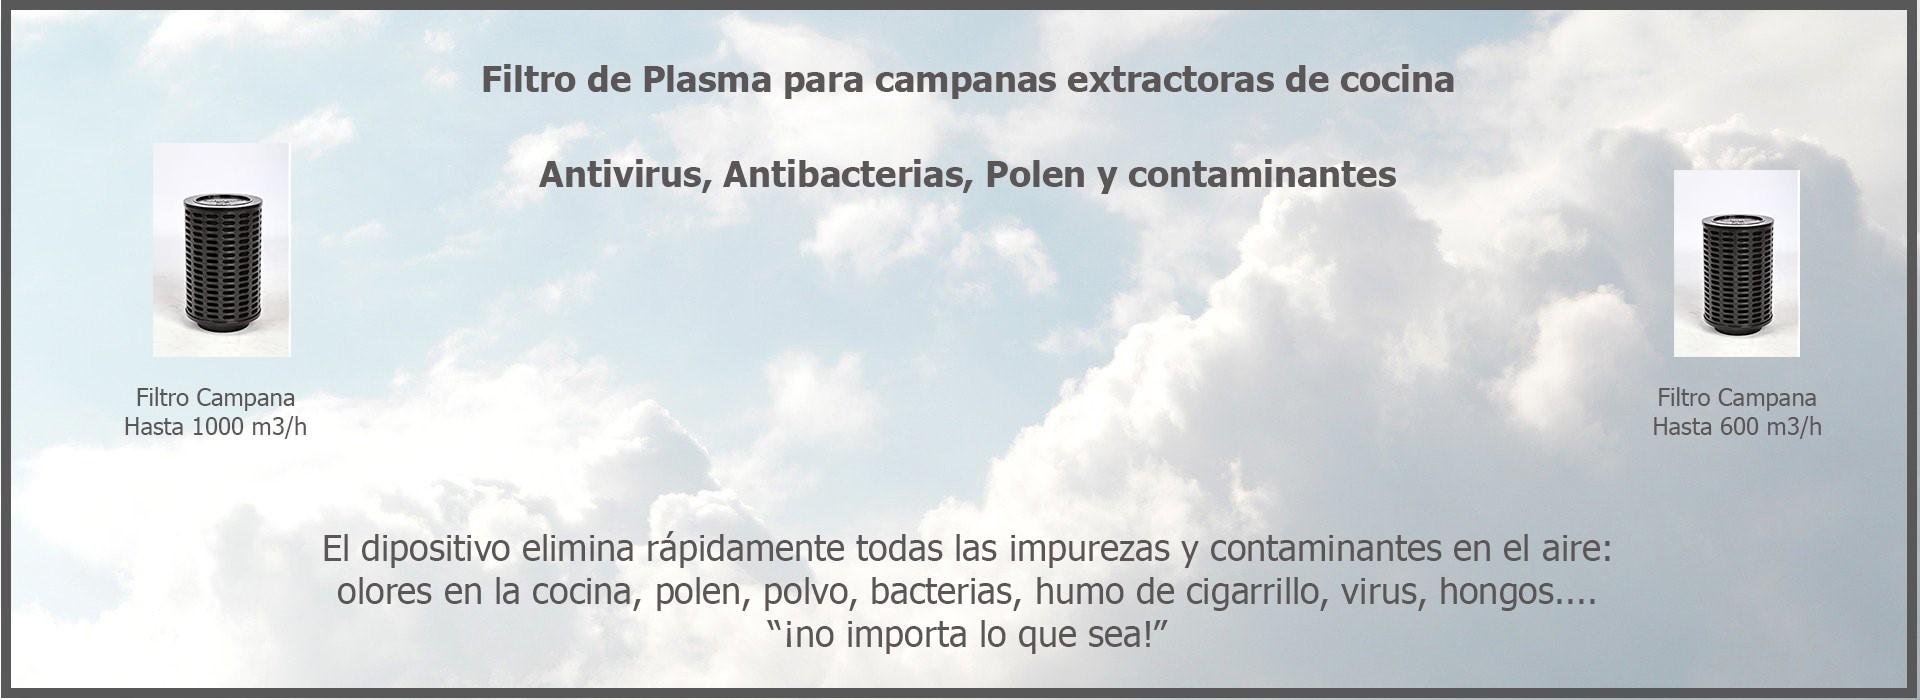 filtro antivirus. Europa Electronic, SL.